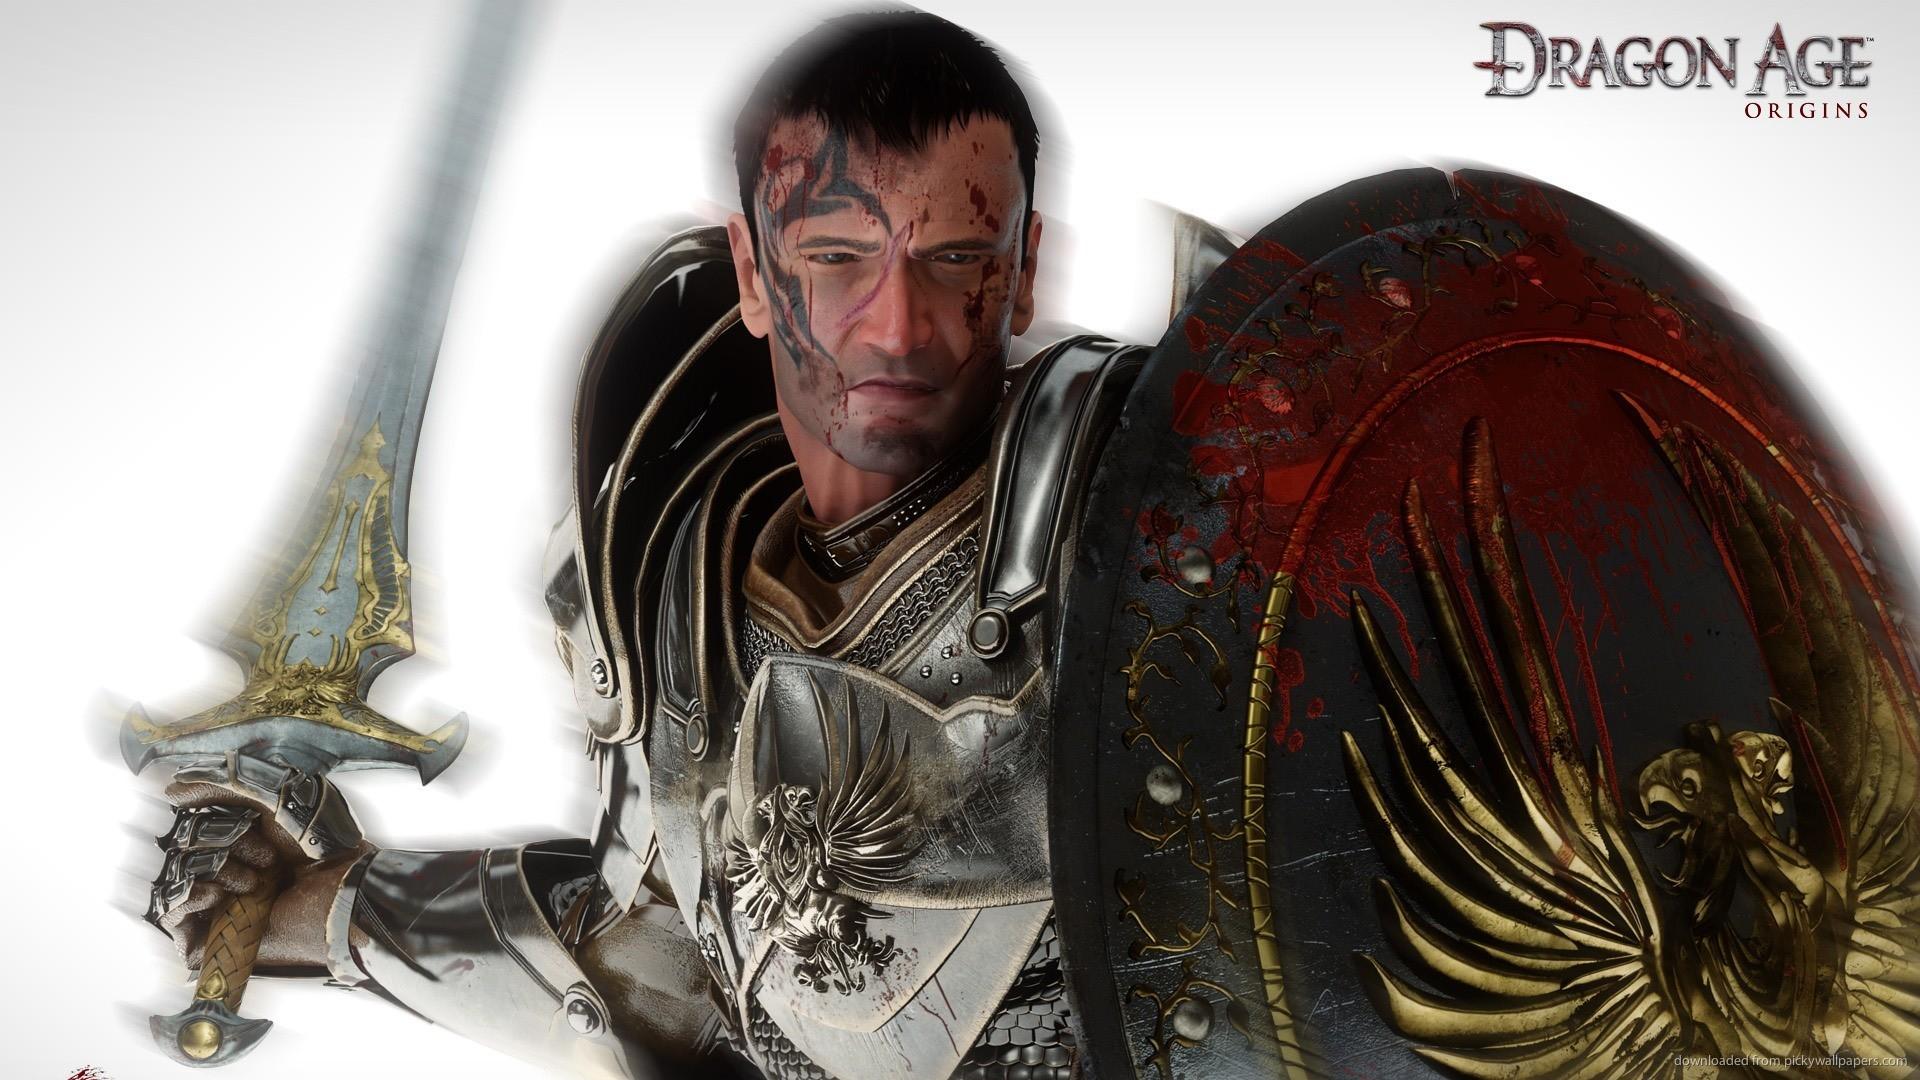 Dragon Age: Origins for 1920×1080